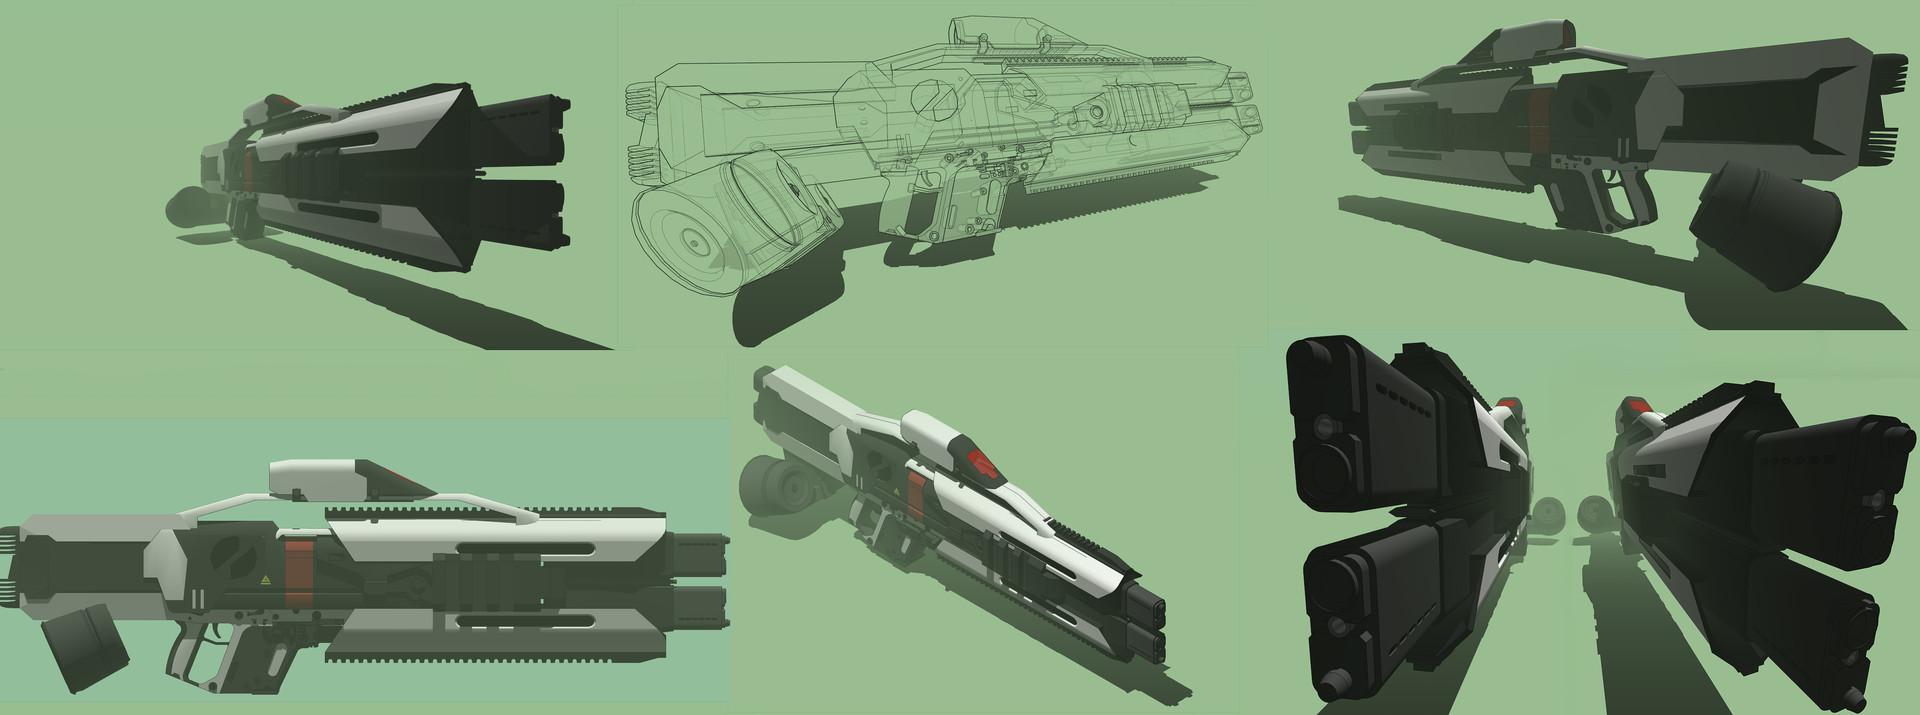 Cristian bruno lai type heavy machinegun